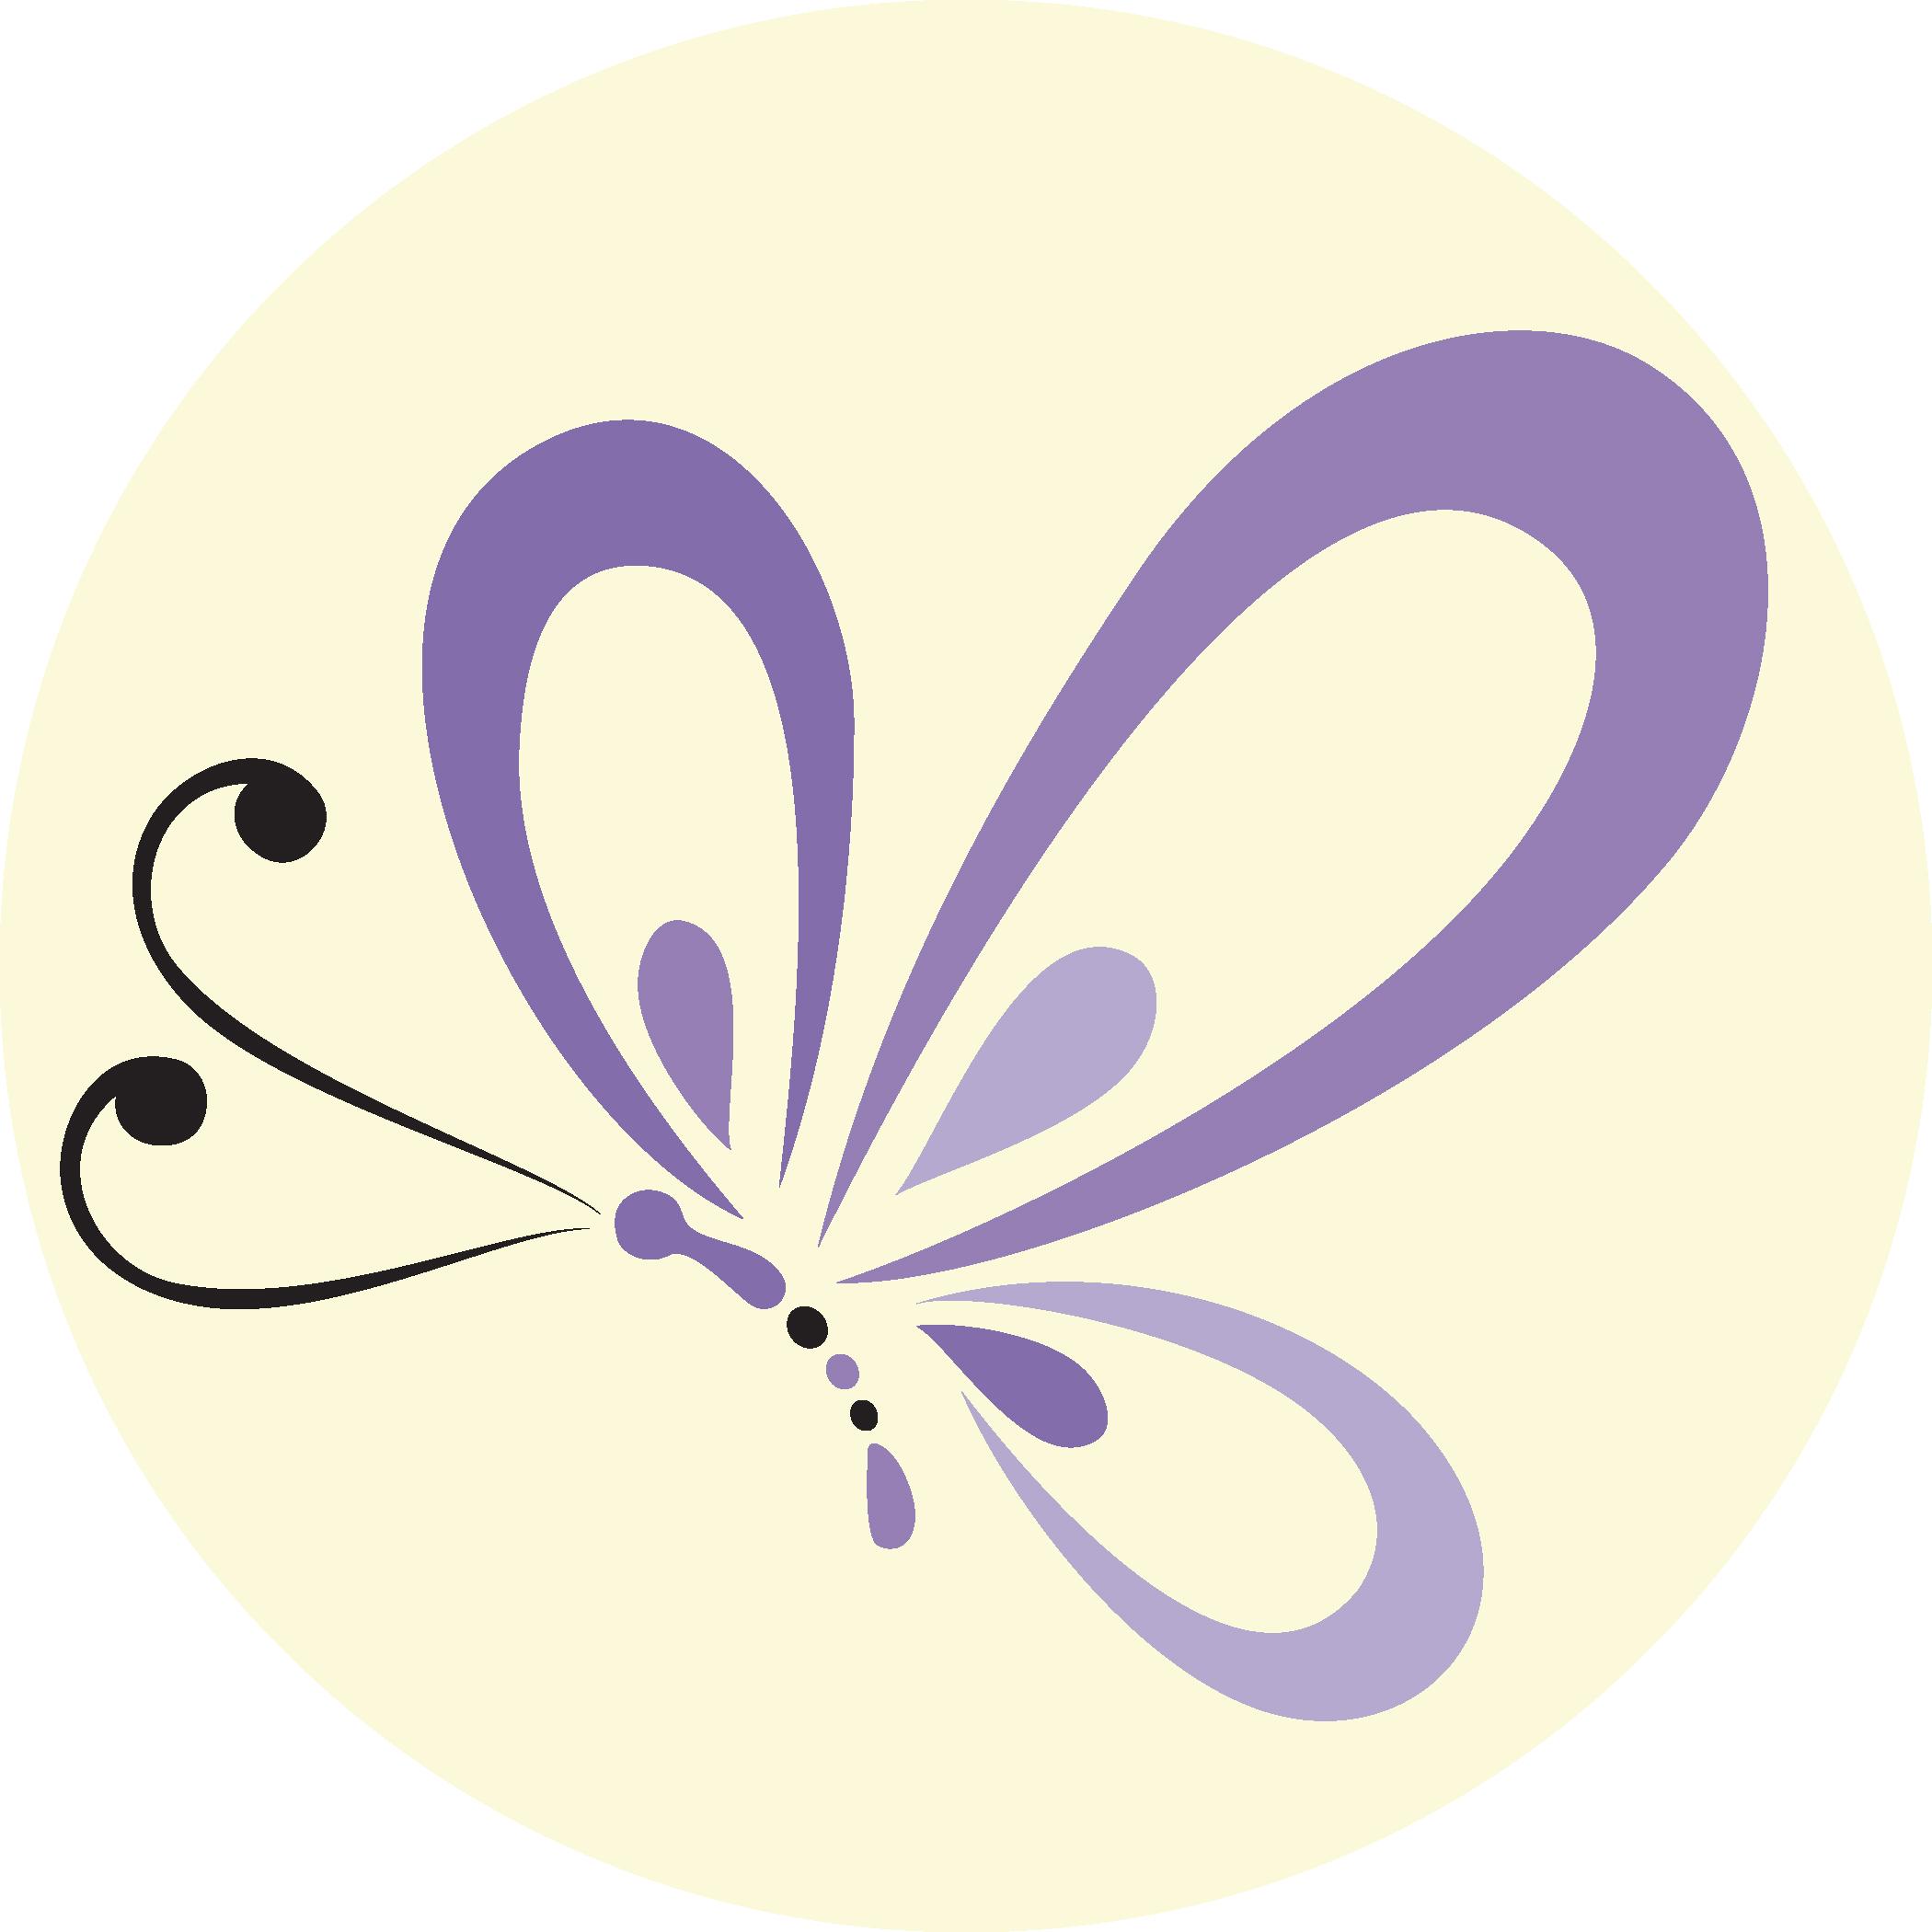 Grieve clipart bereavement Clipart Art Grief Counseling Download